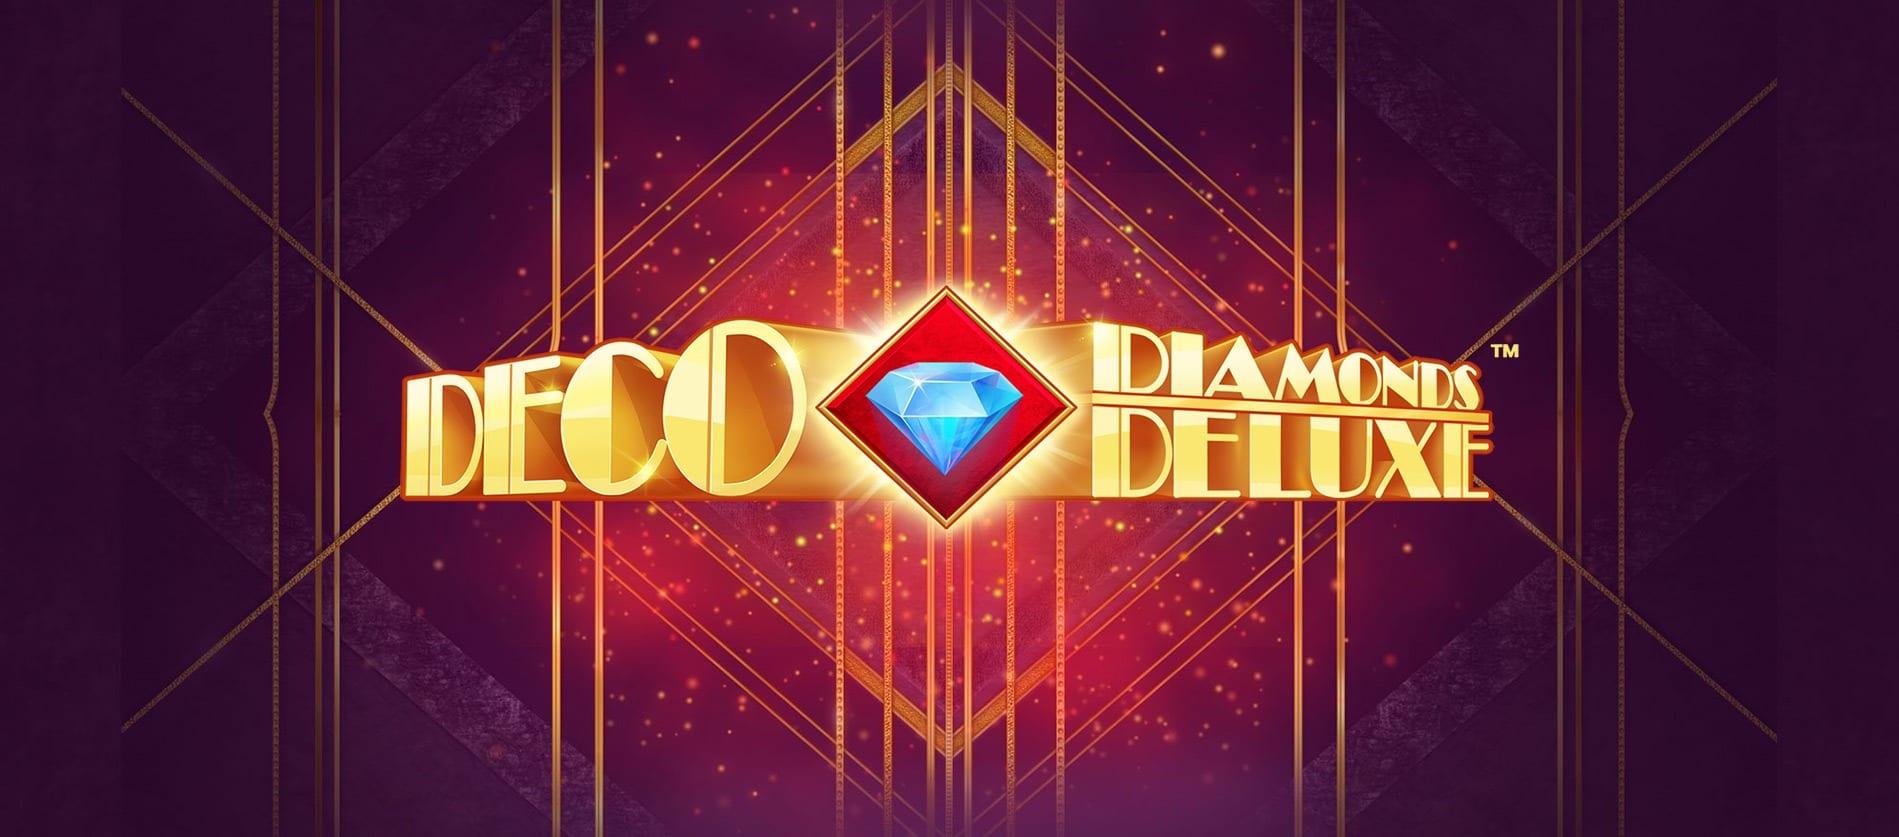 Deco Diamonds Deluxe Slot Logo Wizard Slots